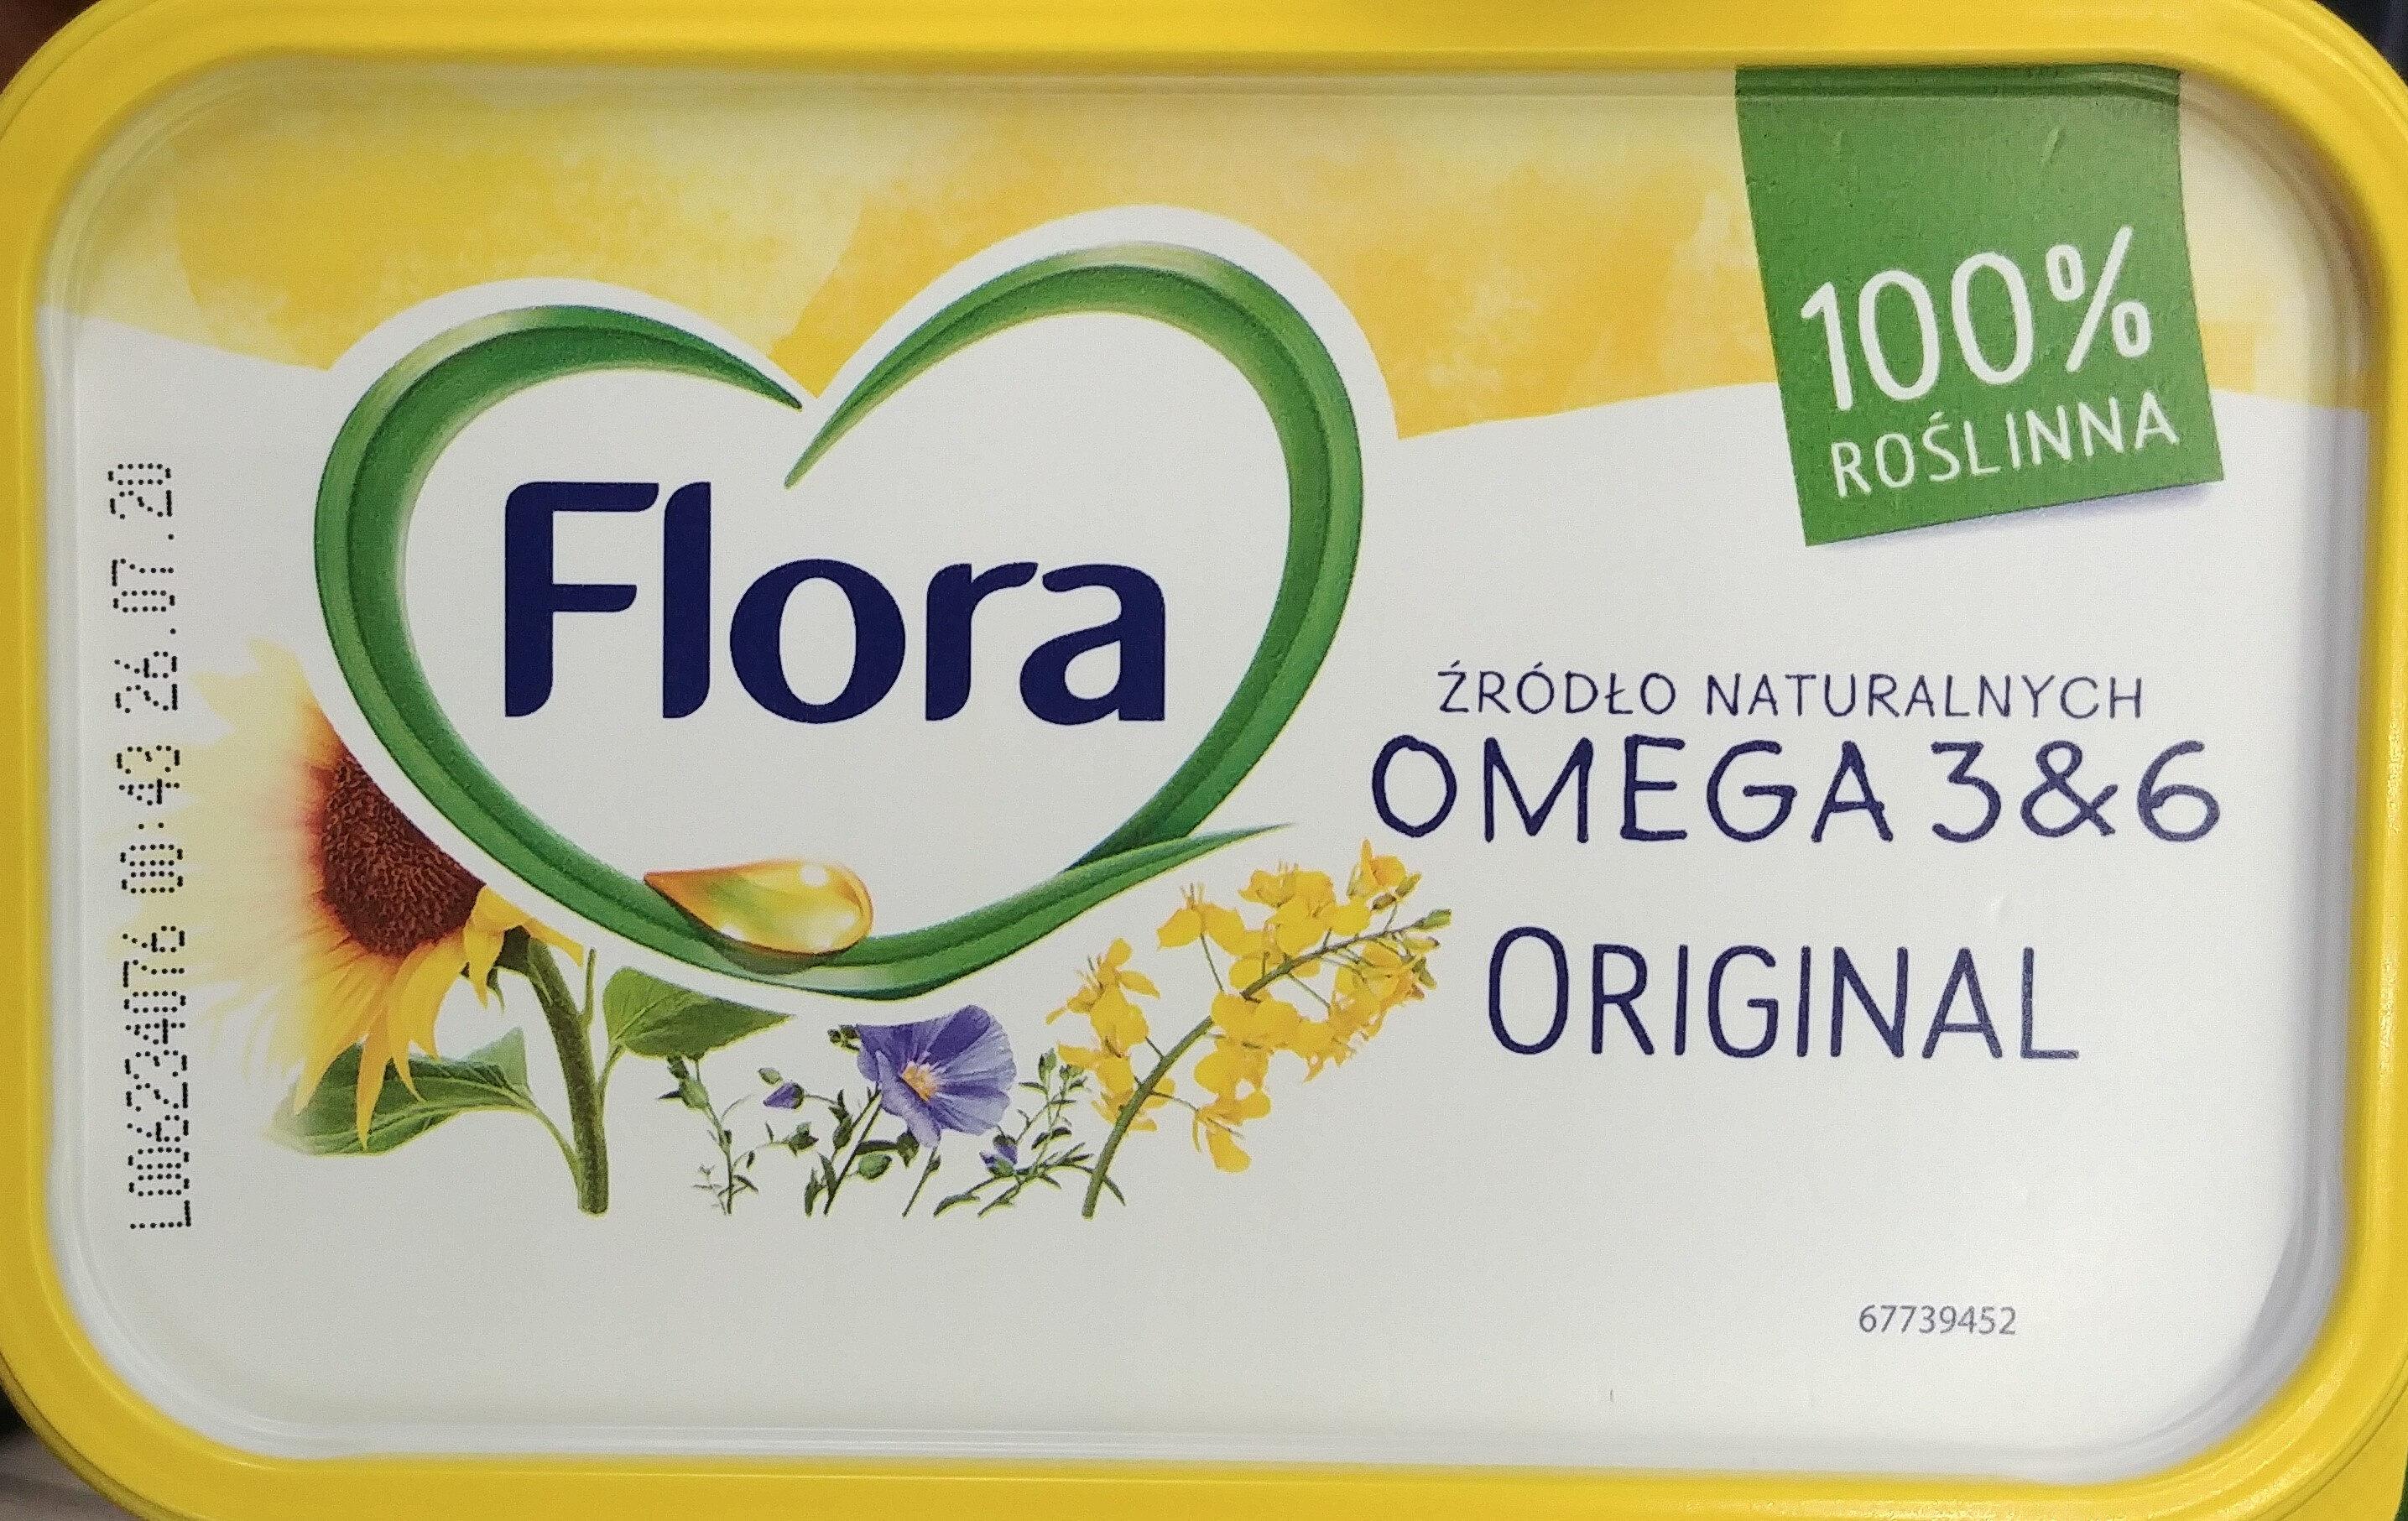 Źródło naturalnych omega 3 & 6 original - Produkt - pl